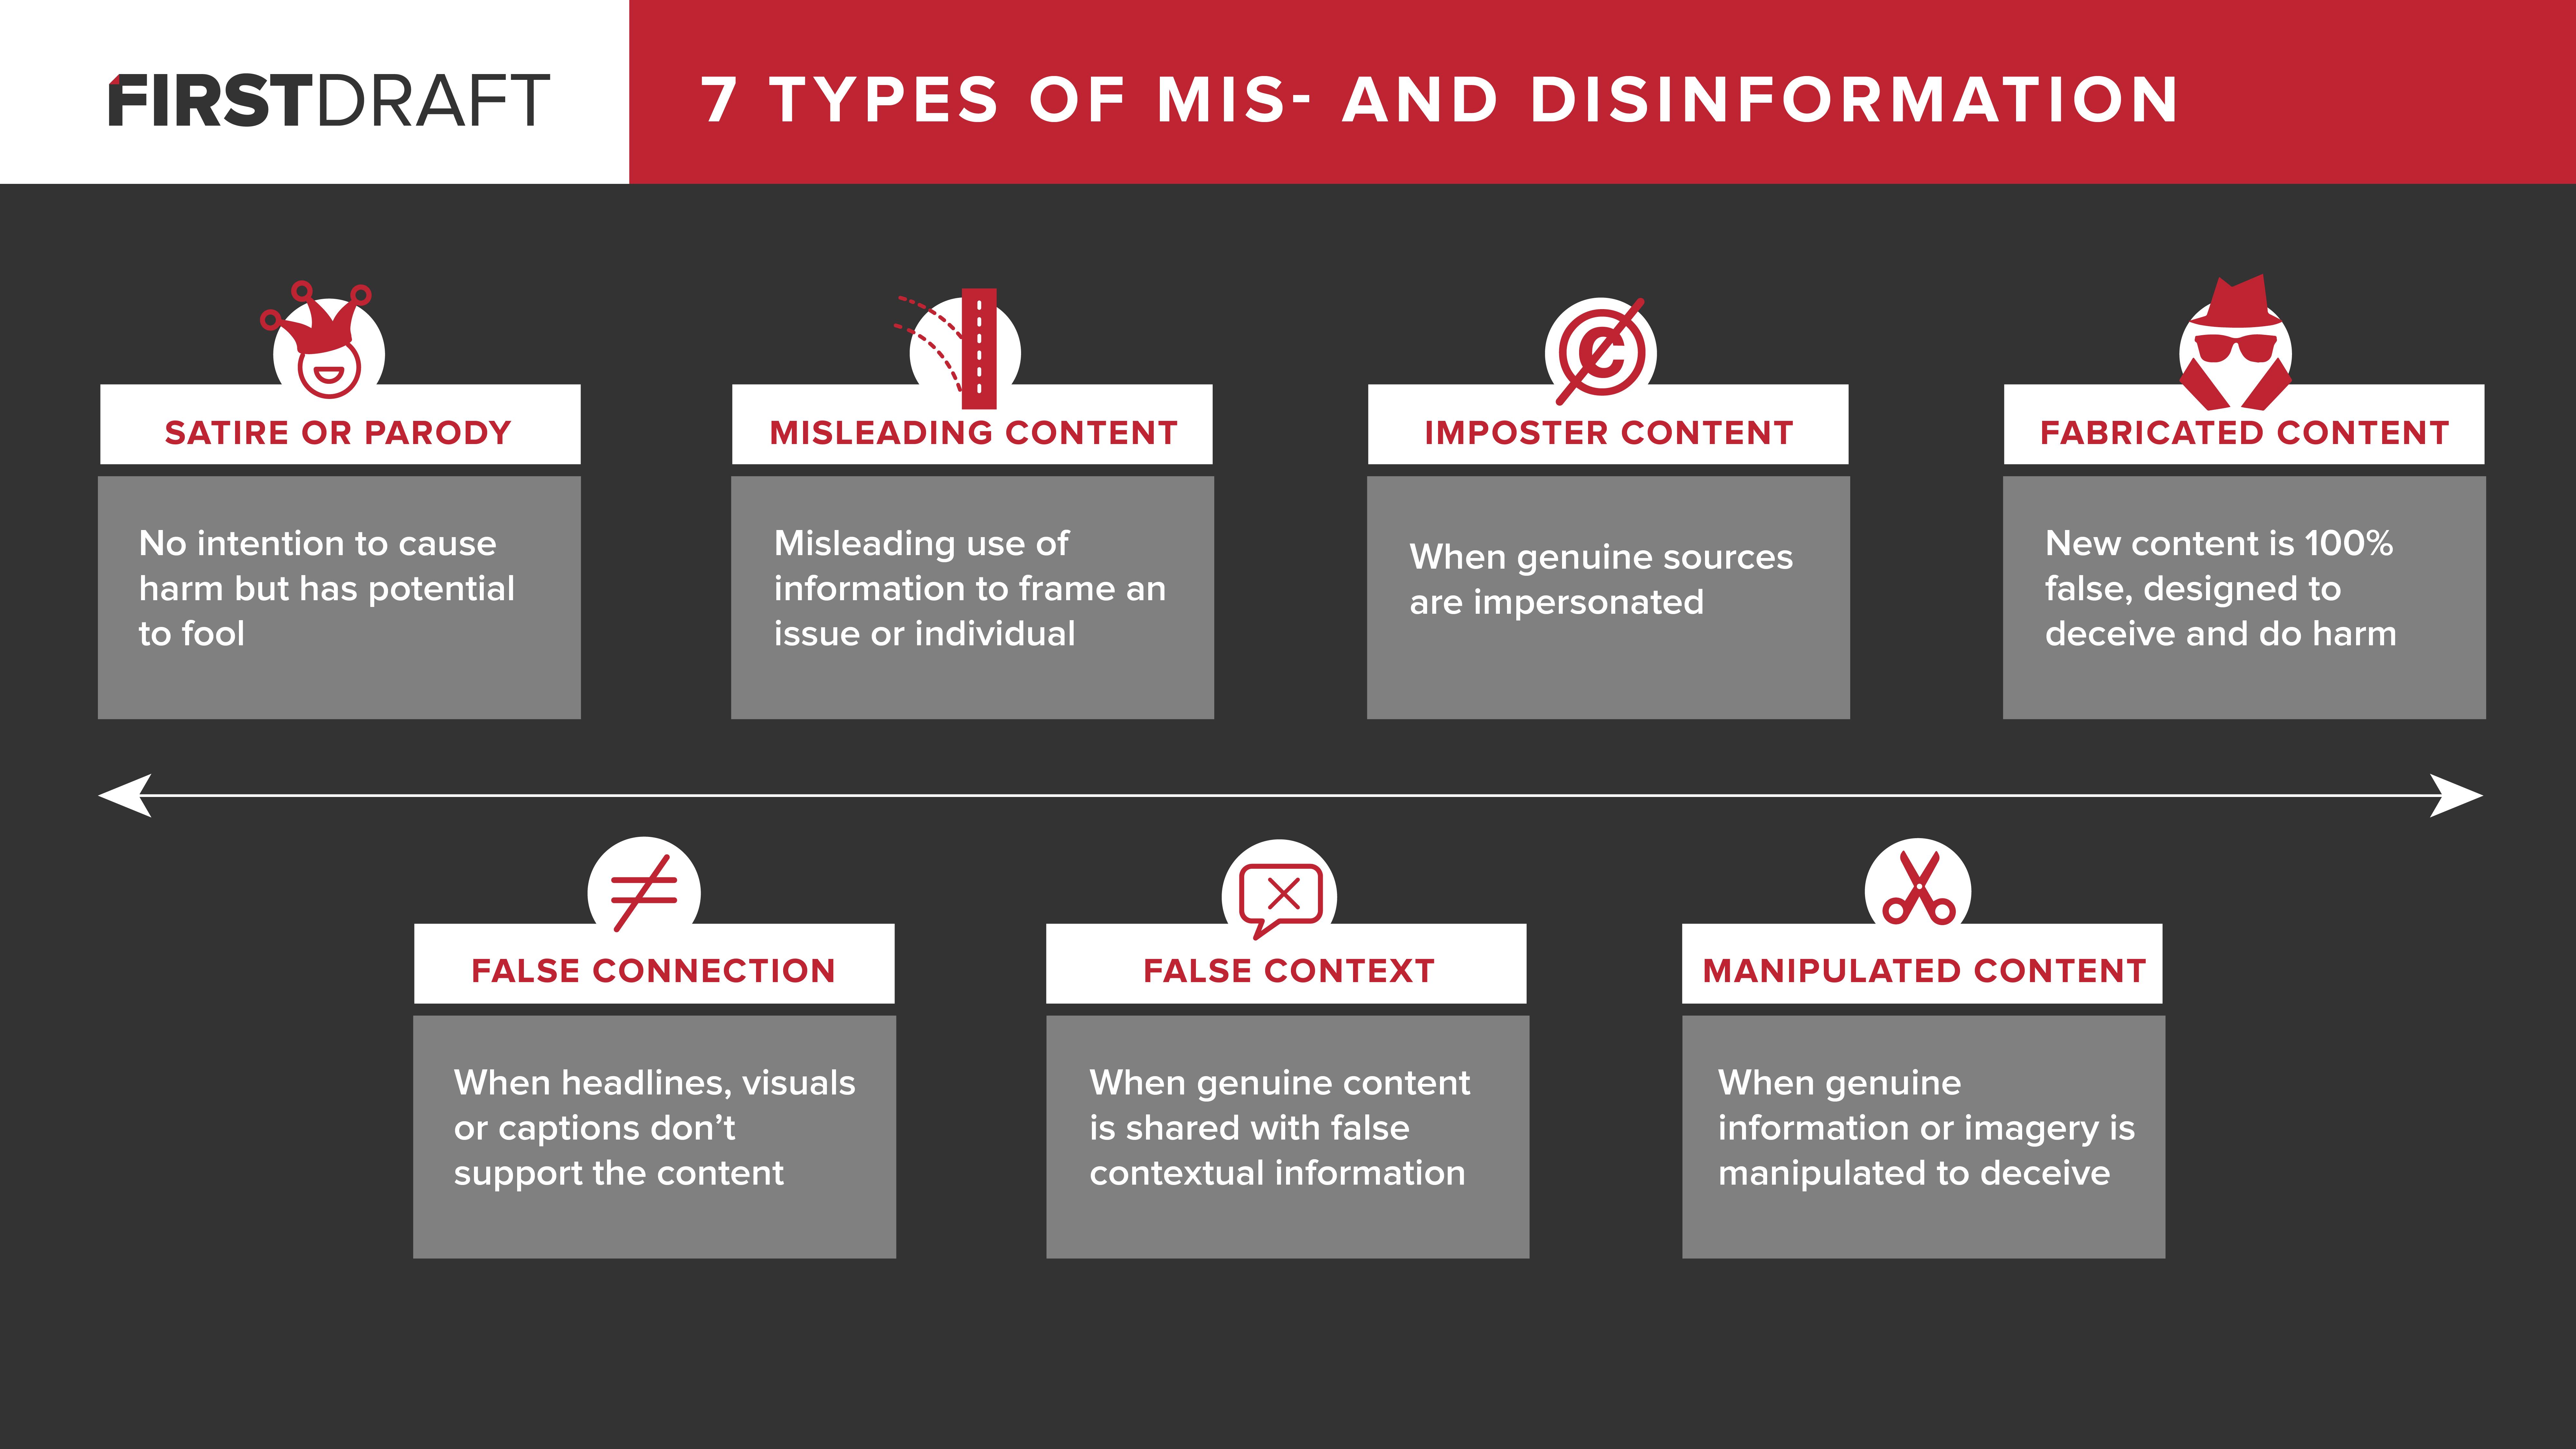 7 types of mis/disinformation